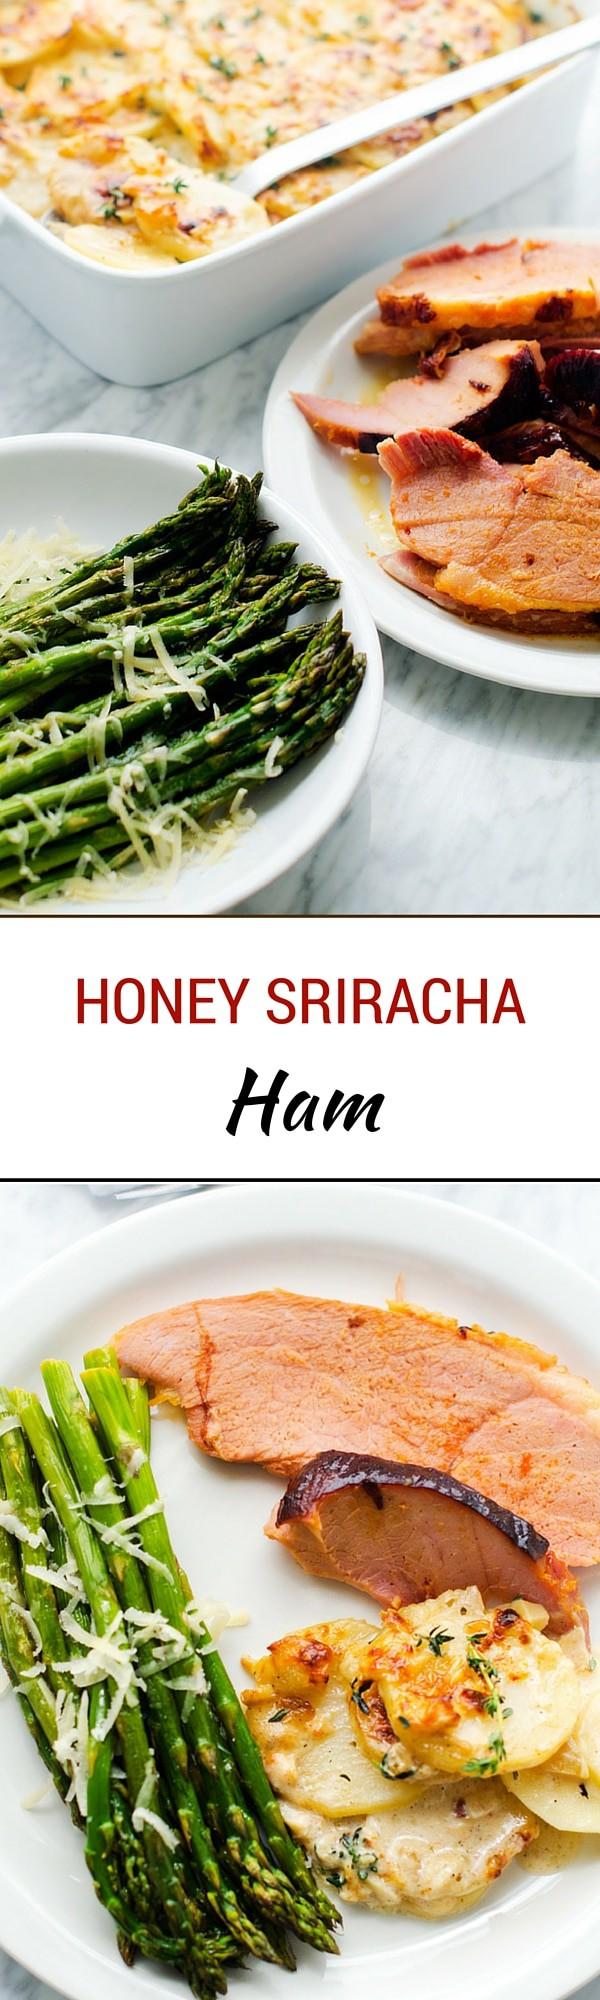 Honey Sriracha Ham- WendyPolisi.com